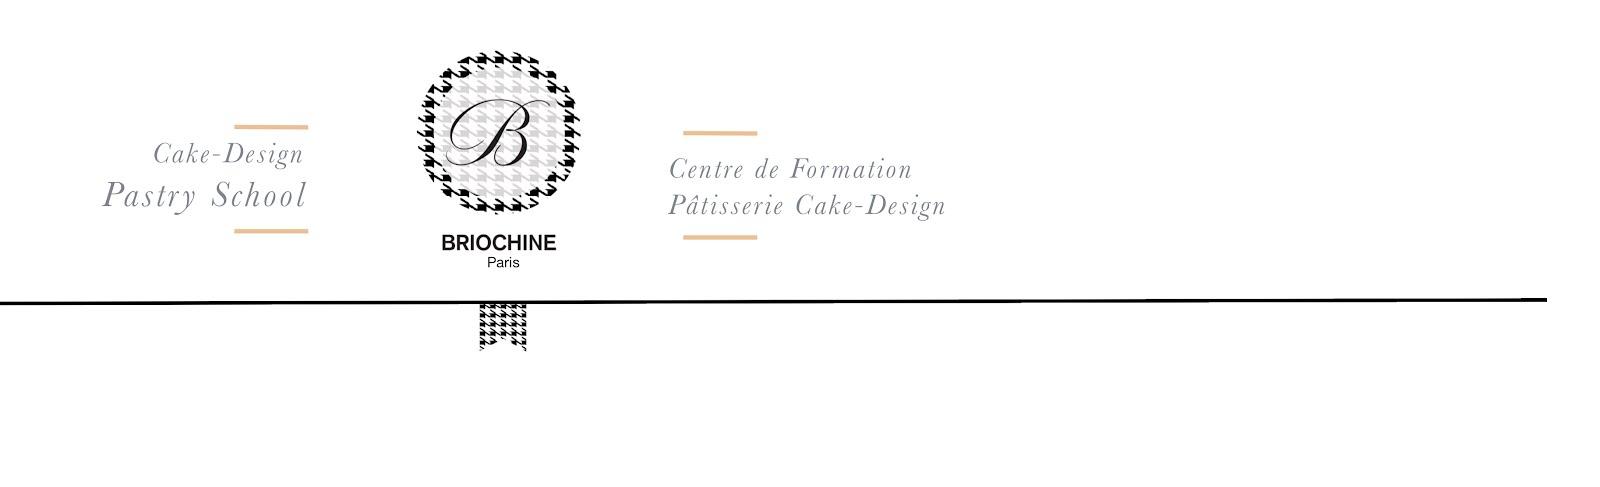 BRIOCHINE Cake Design